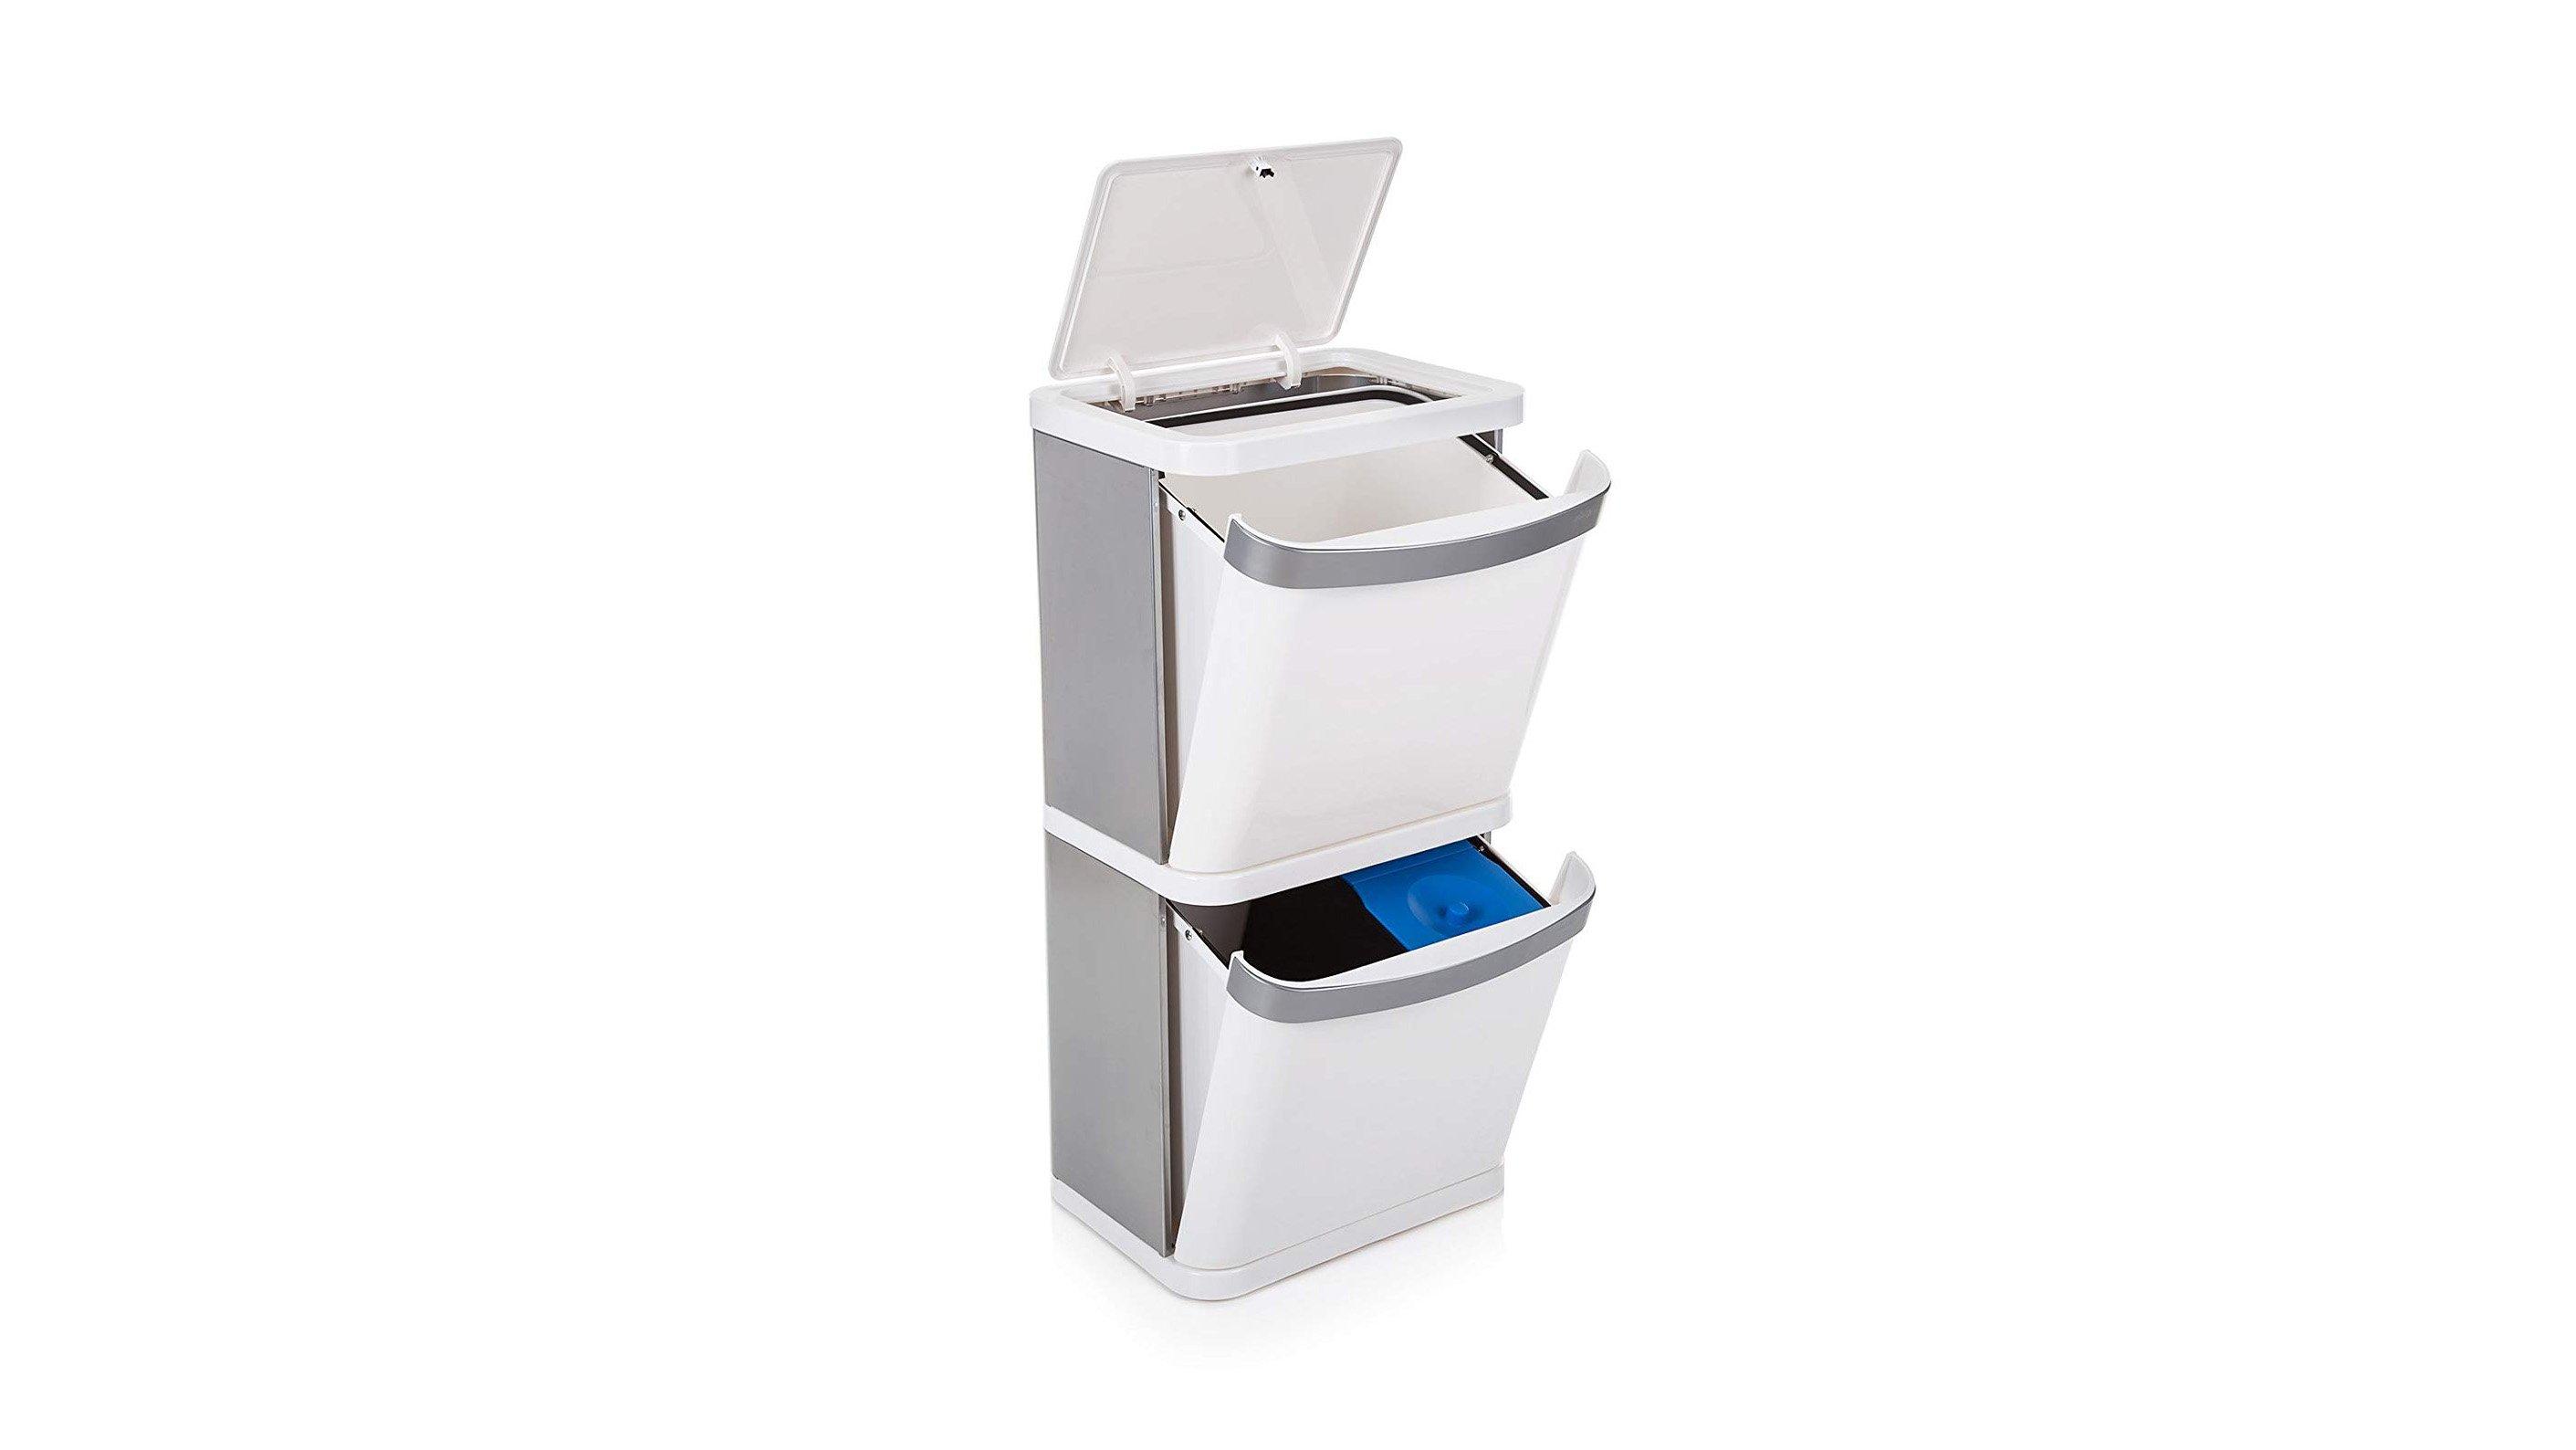 best kitchen bins the best retro slimline and recycling. Black Bedroom Furniture Sets. Home Design Ideas